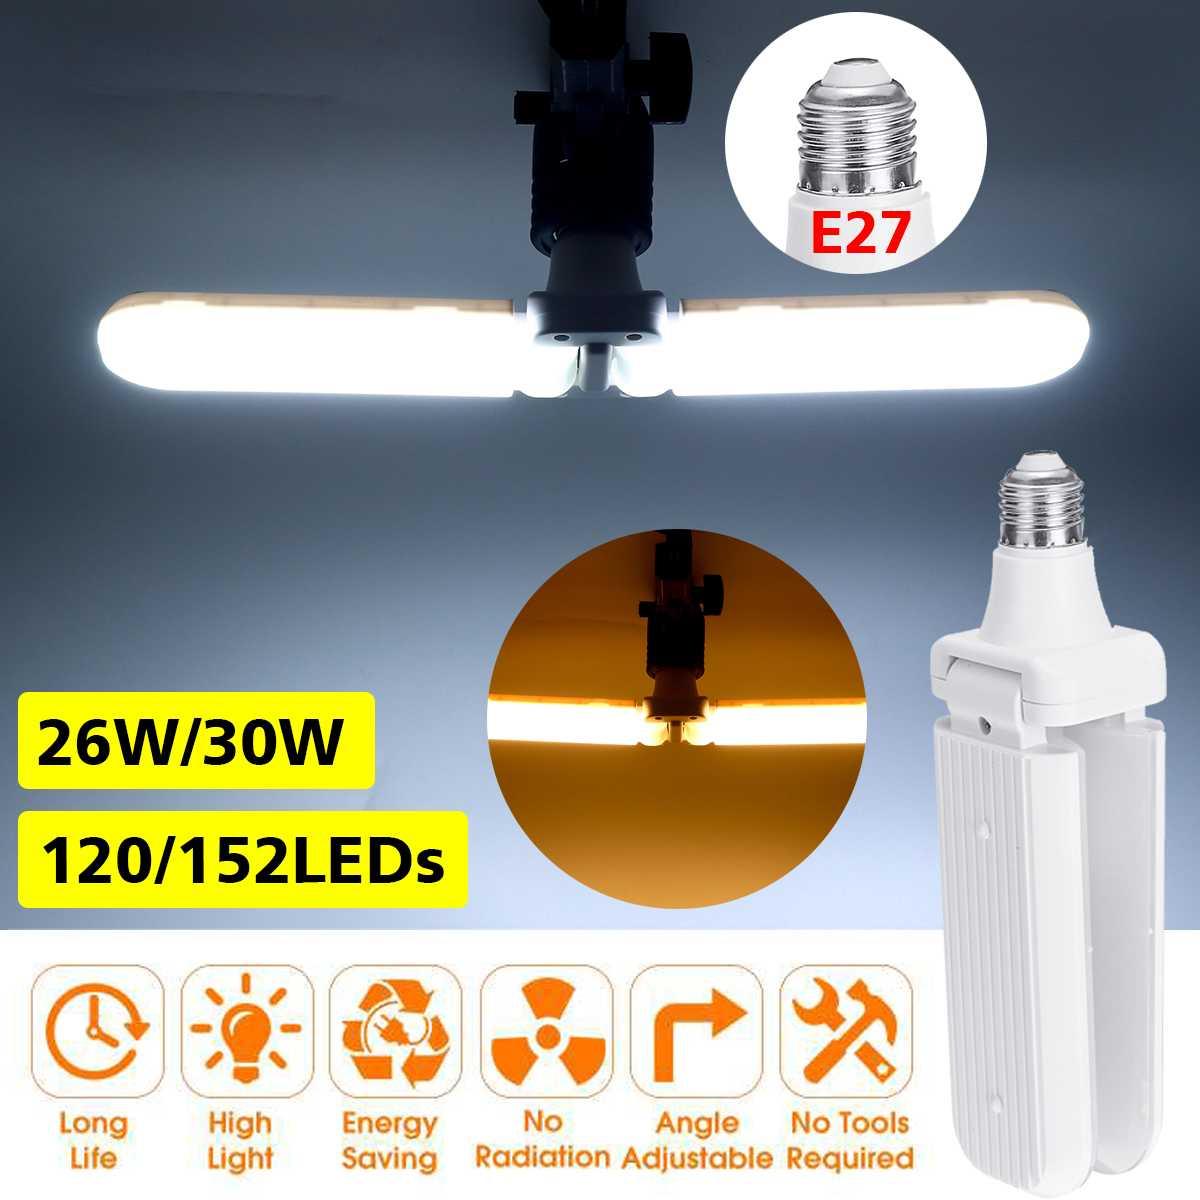 E27 30W LED Folding Garage Lamp High Brightness Constant Current Light Bulb Neu